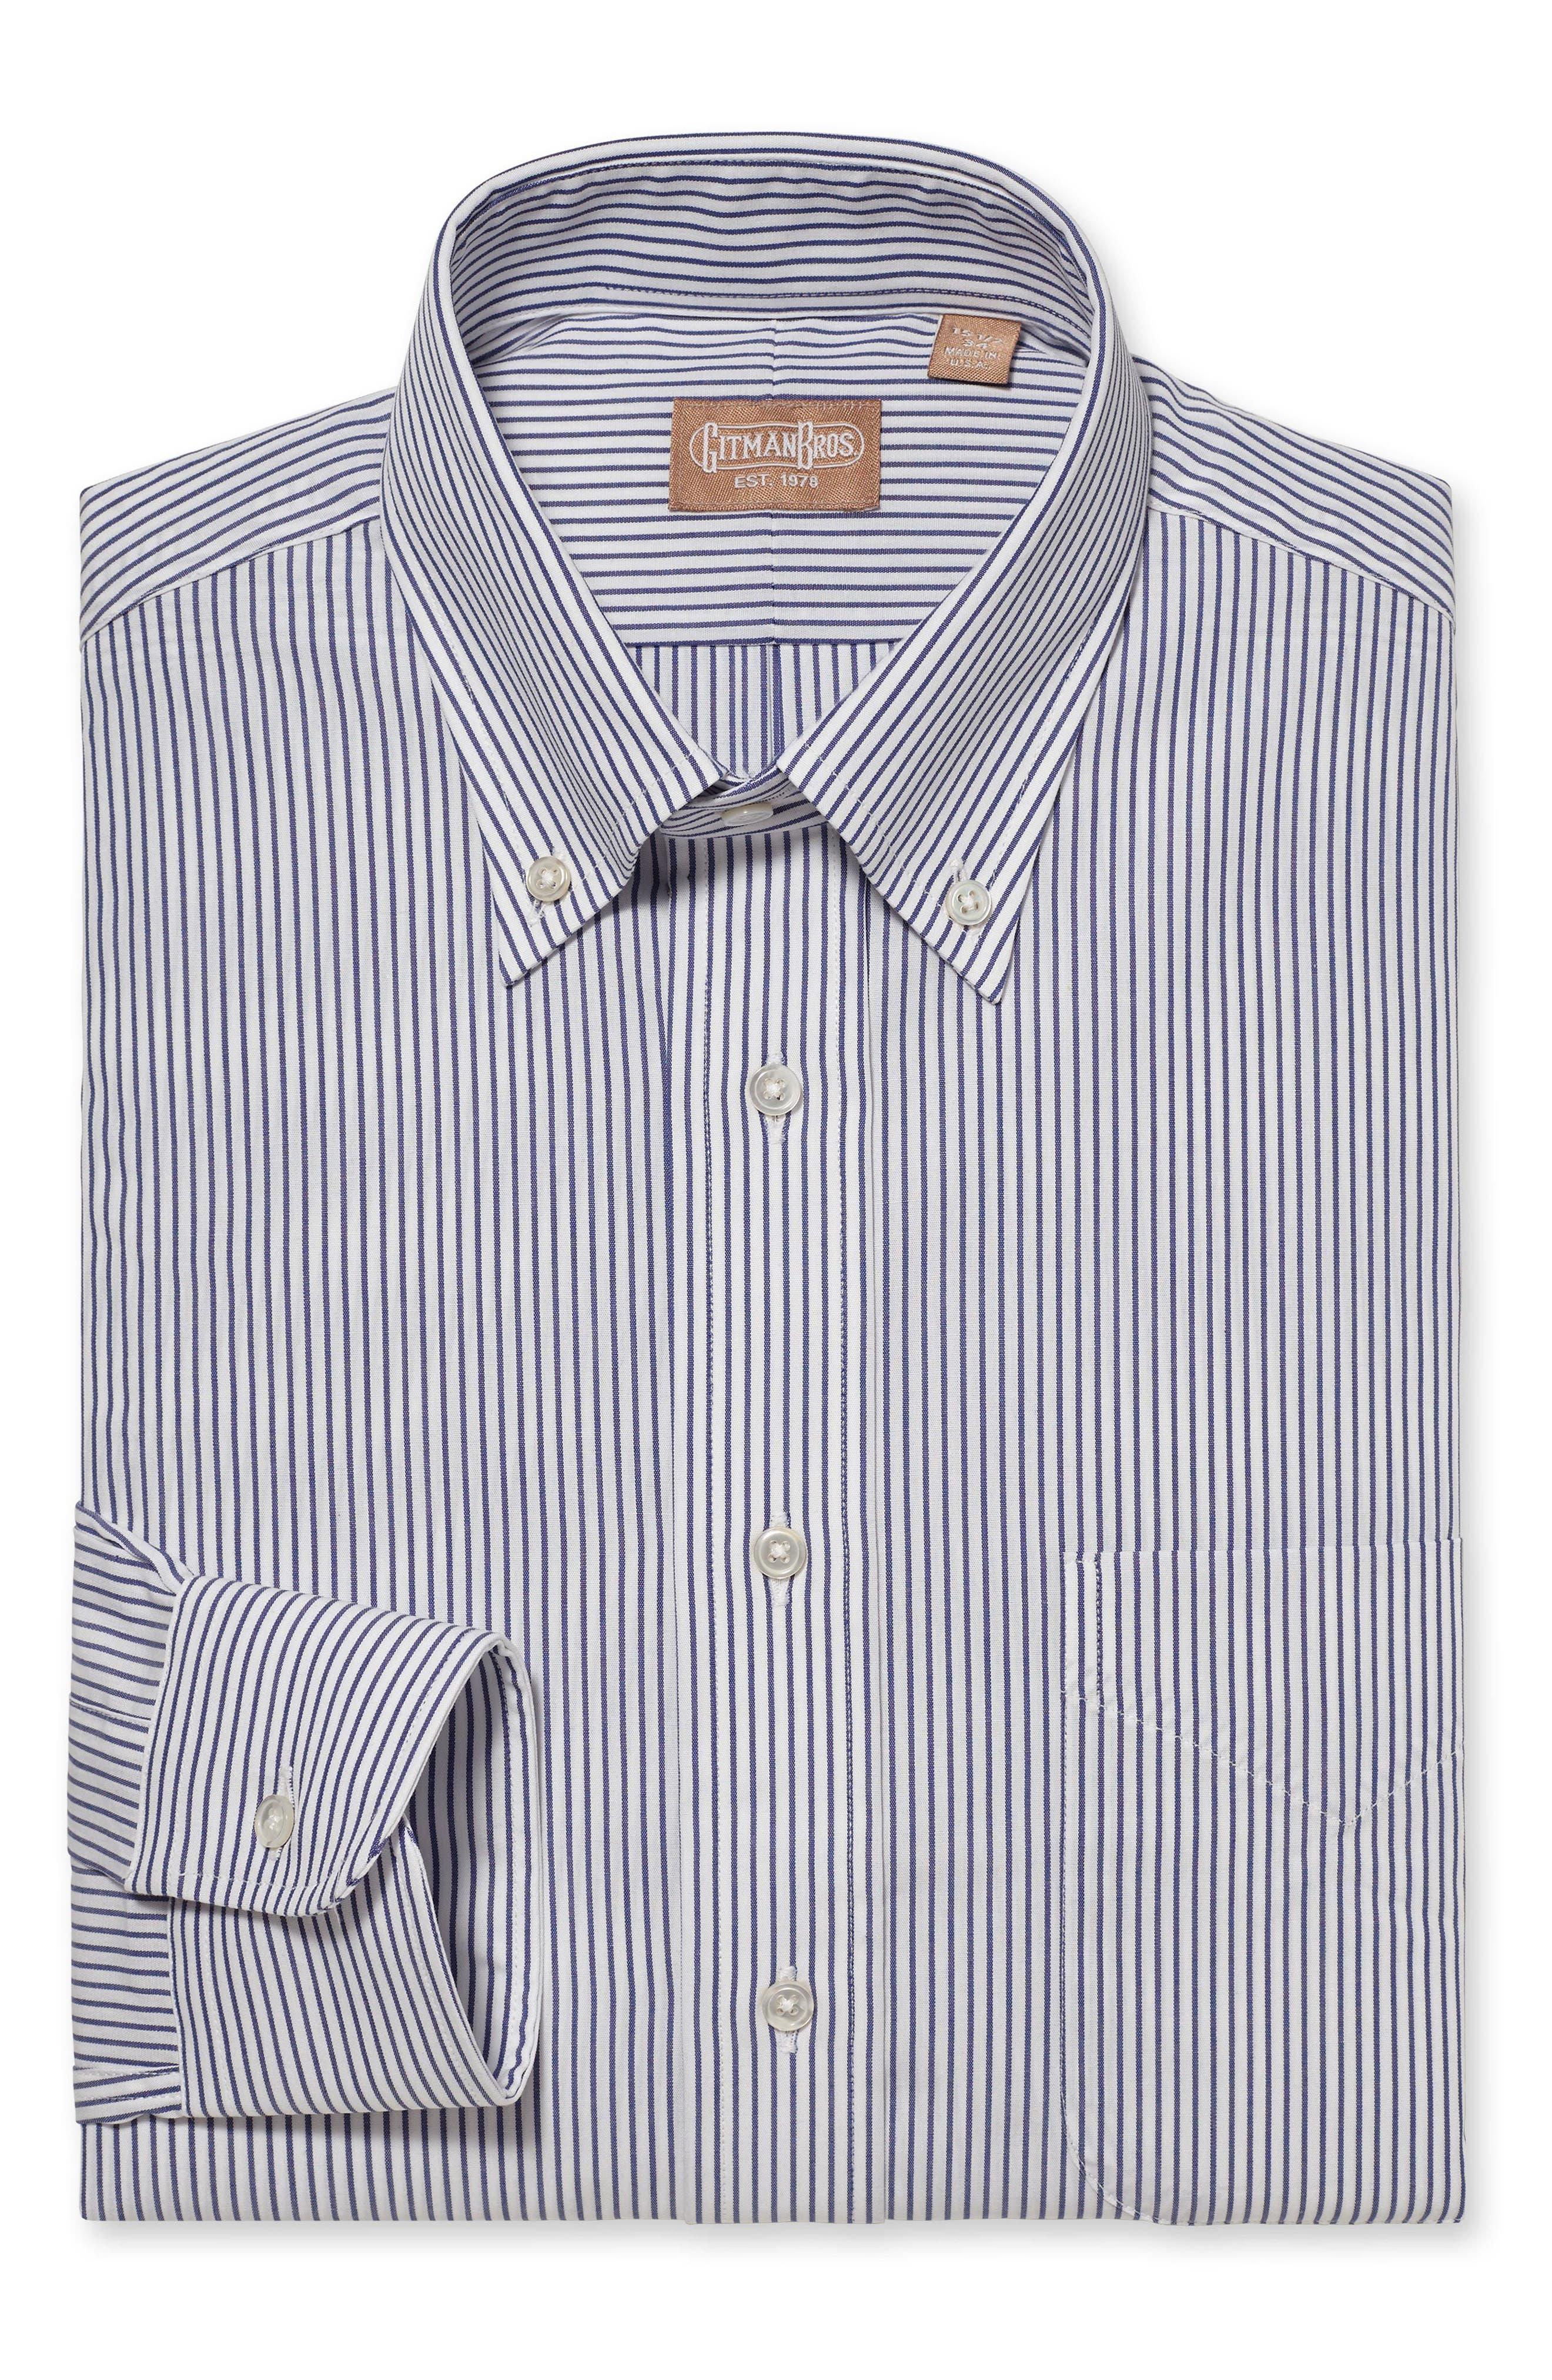 Regular Fit Stripe Dress Shirt,                         Main,                         color, 400